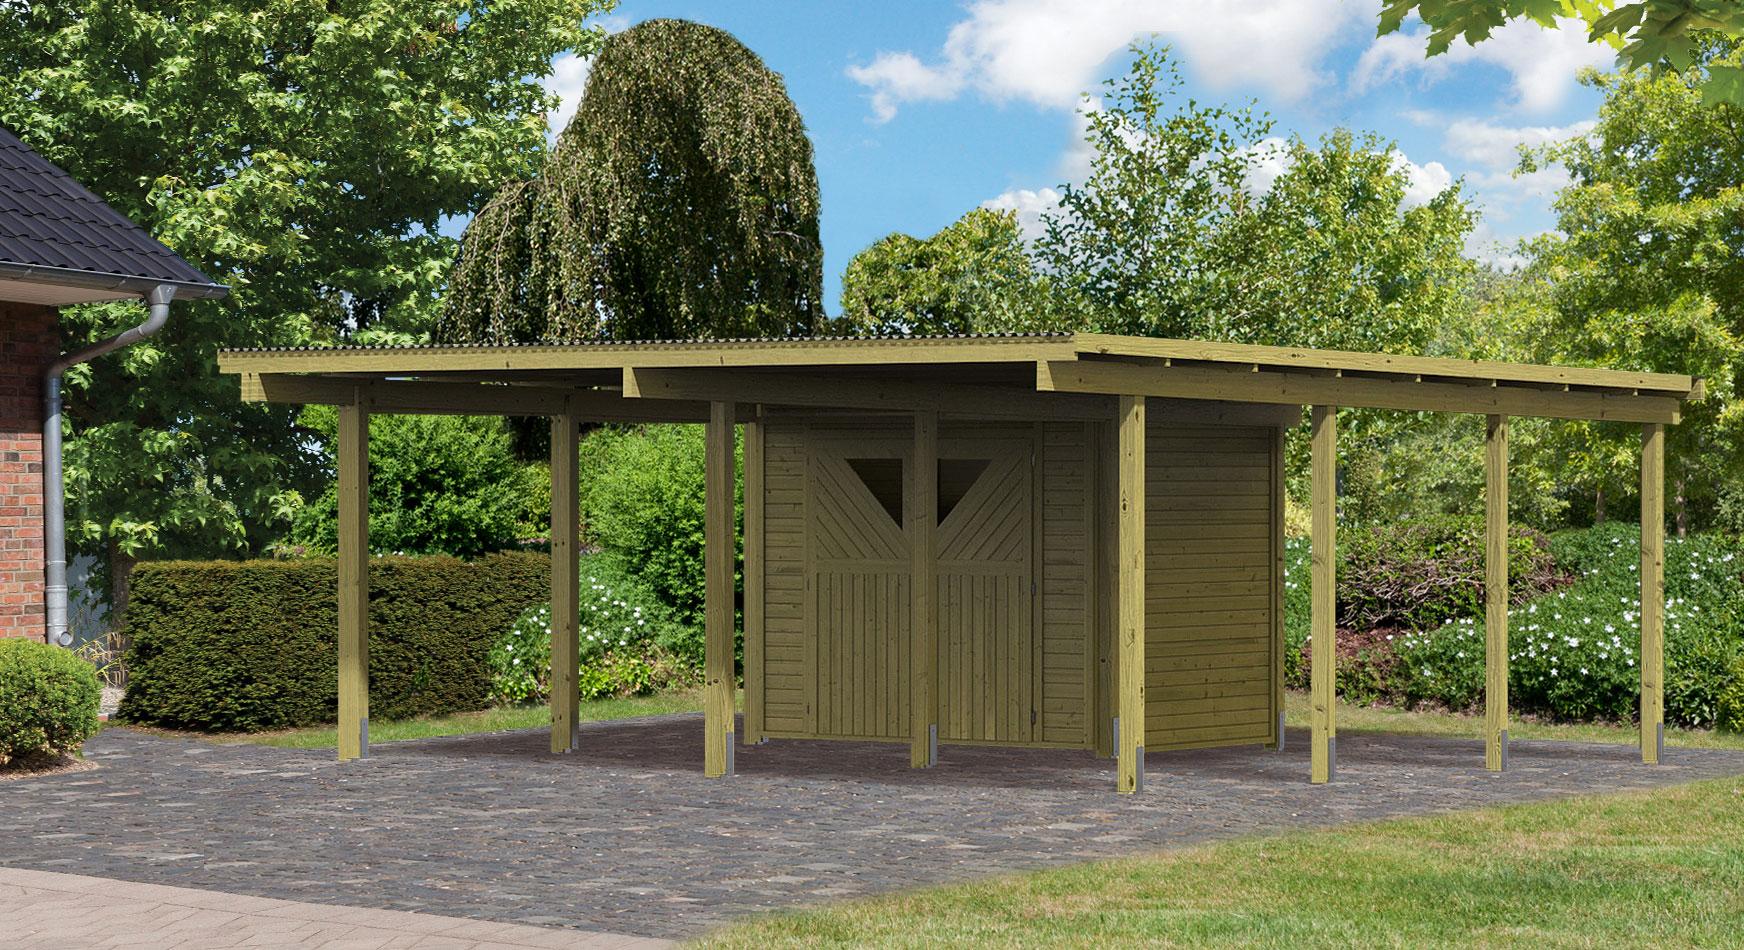 karibu eco carport mit abstellraum 1 kdi 563x676cm bei. Black Bedroom Furniture Sets. Home Design Ideas